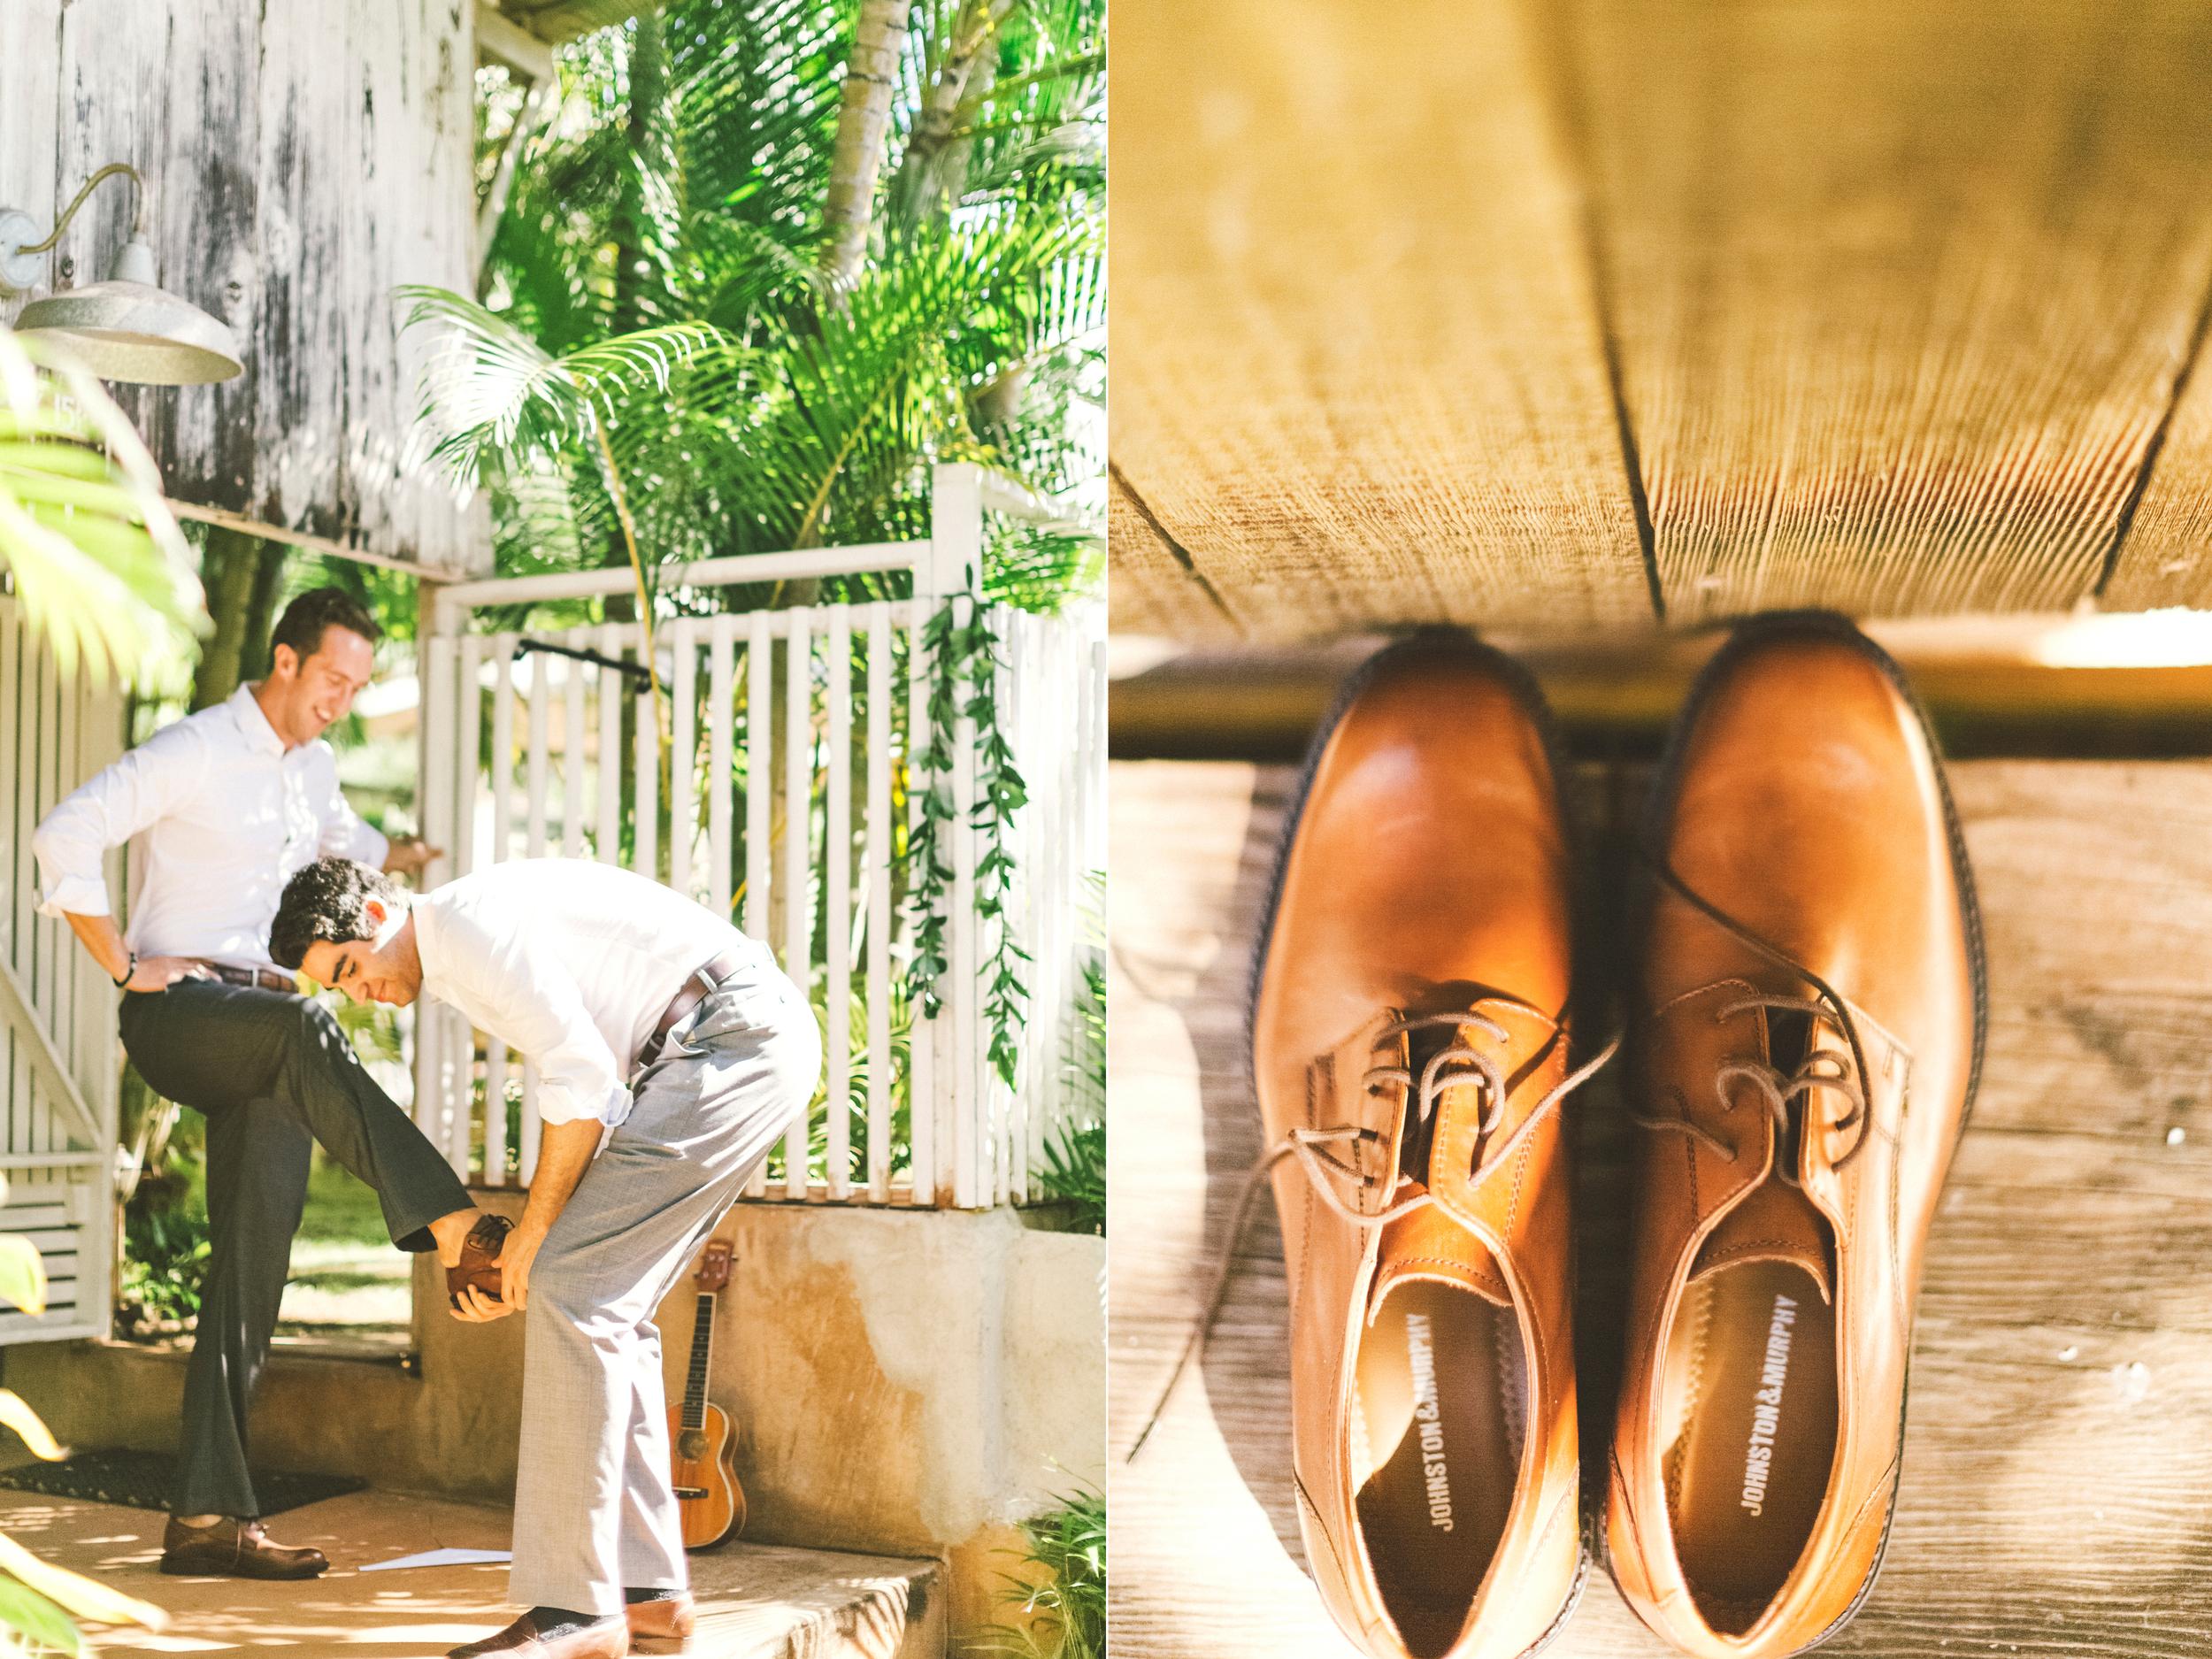 angie-diaz-photography-maui-wedding-17.jpg